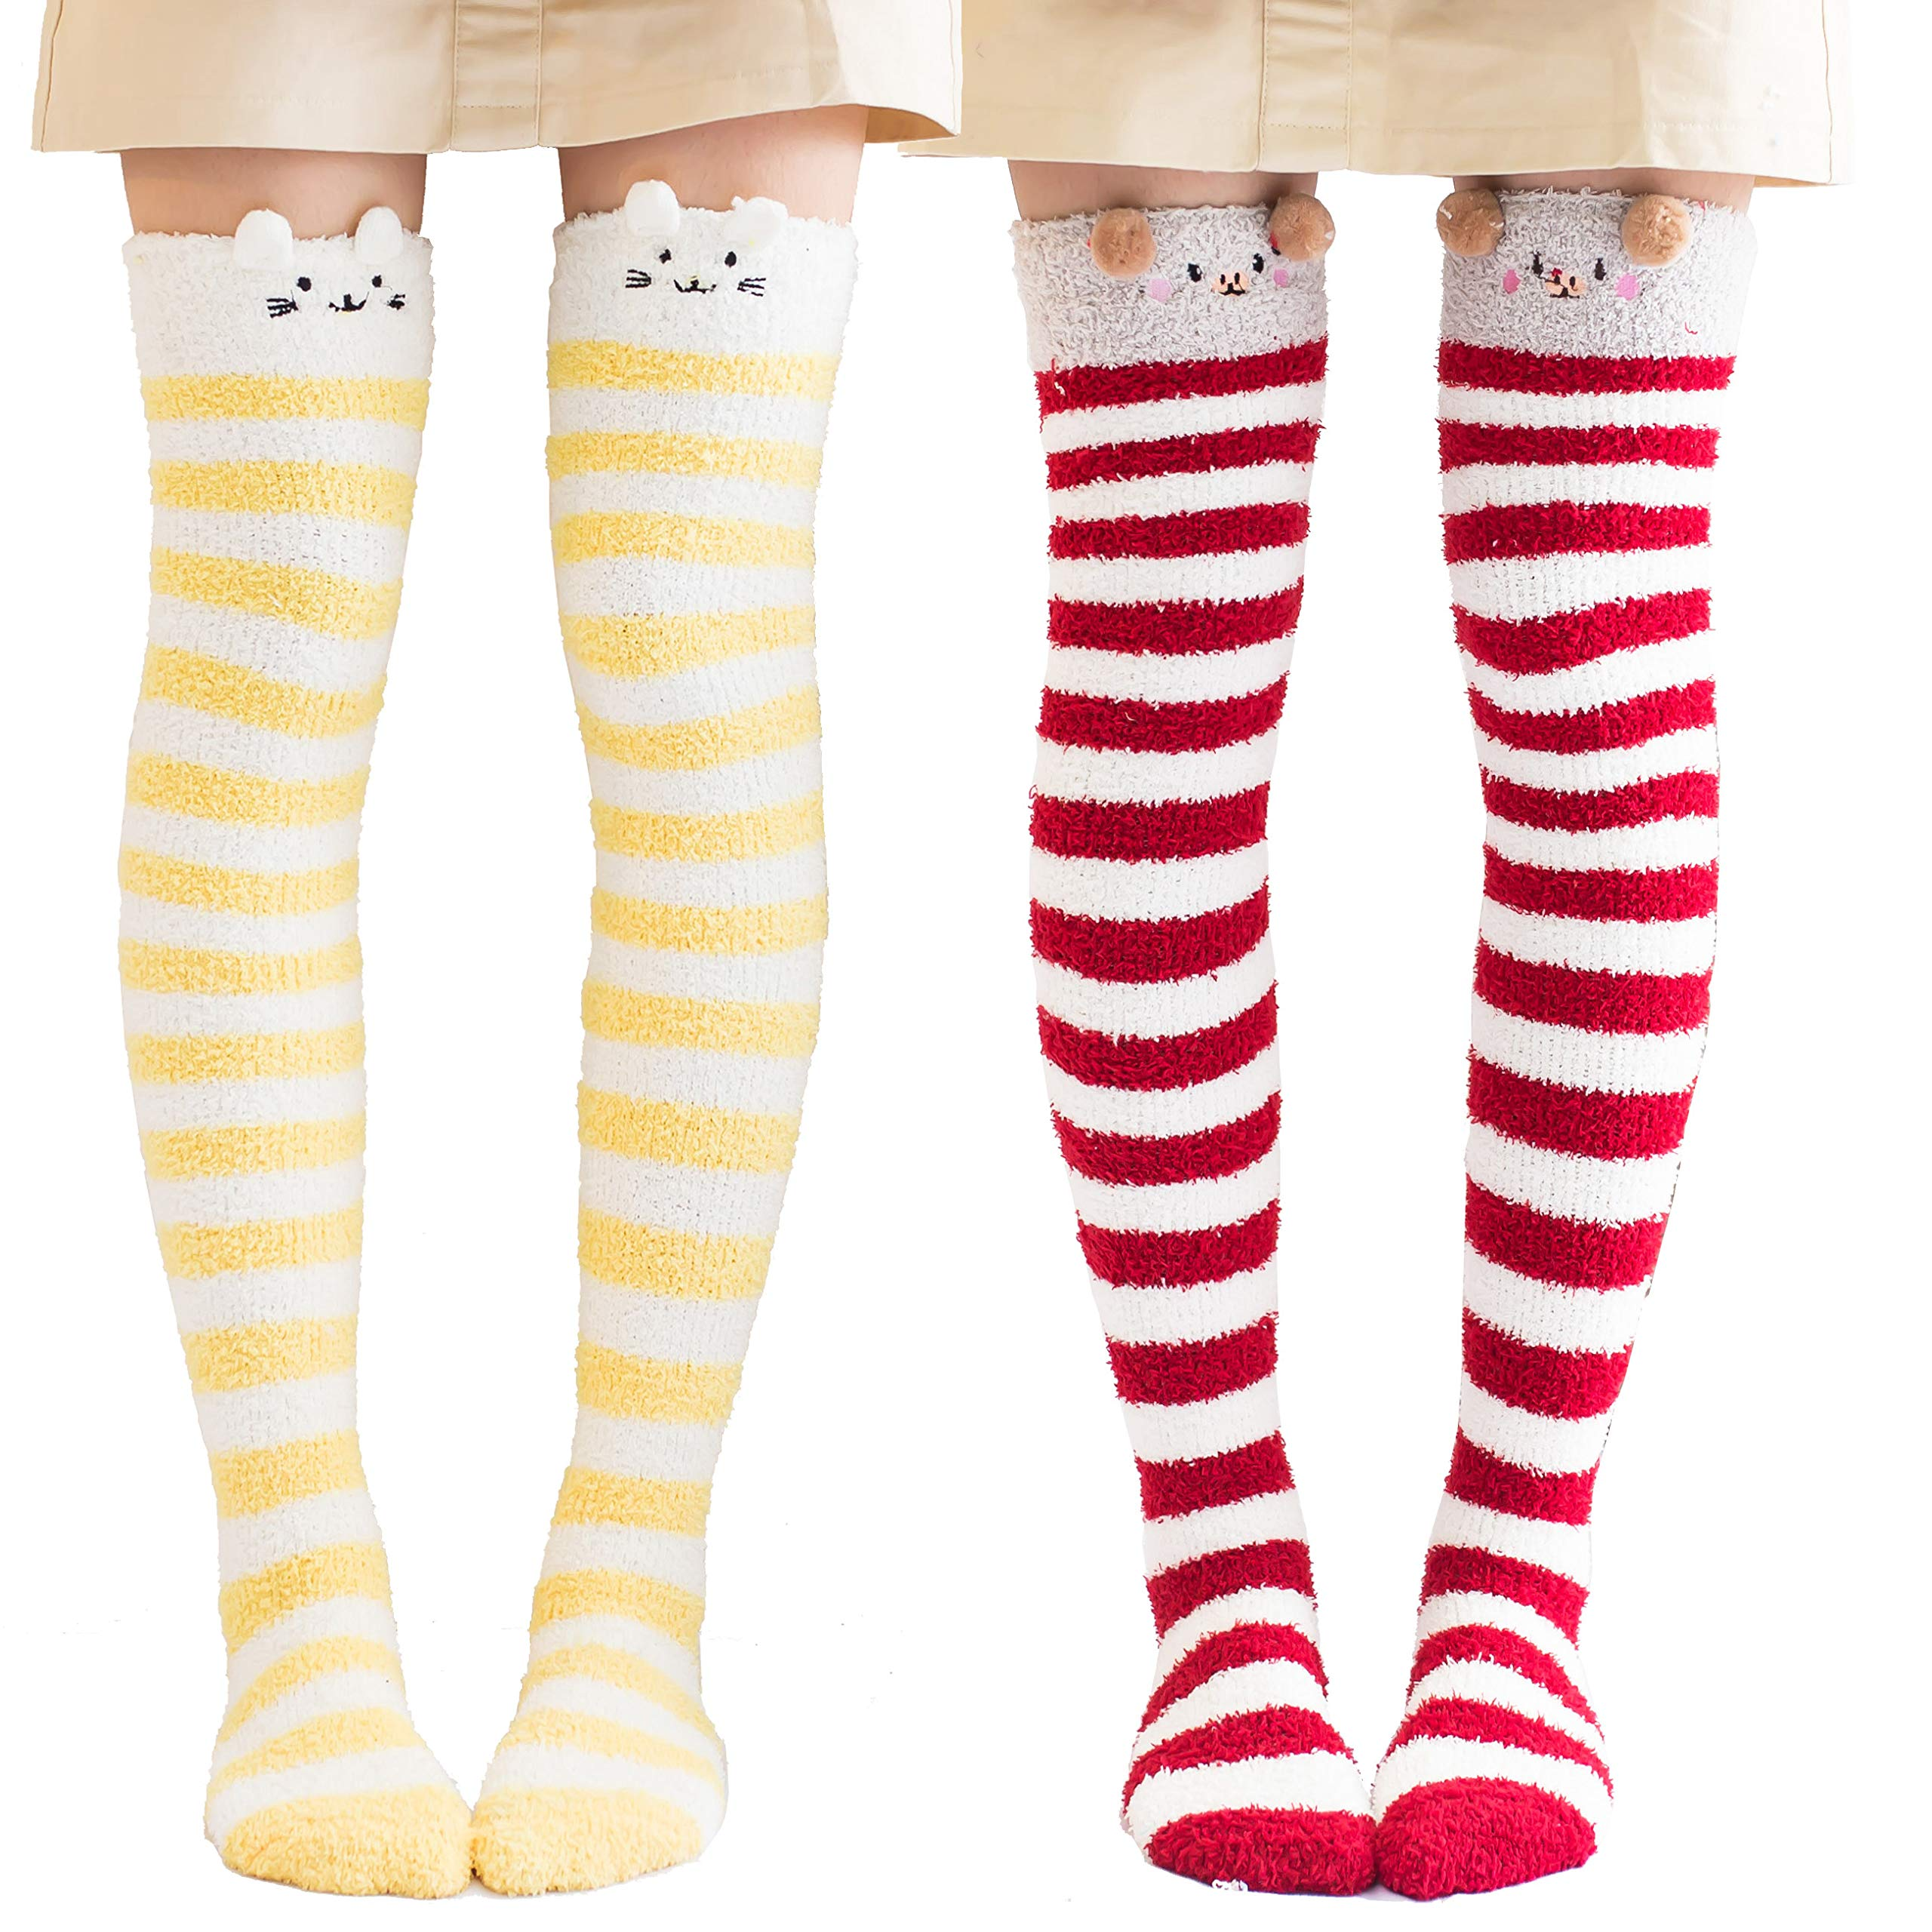 Fitu Womens Cartoon Soft Warm Over Knee High Stockings Fuzzy Socks Cute Animal Fleece Socks (Mix 1)